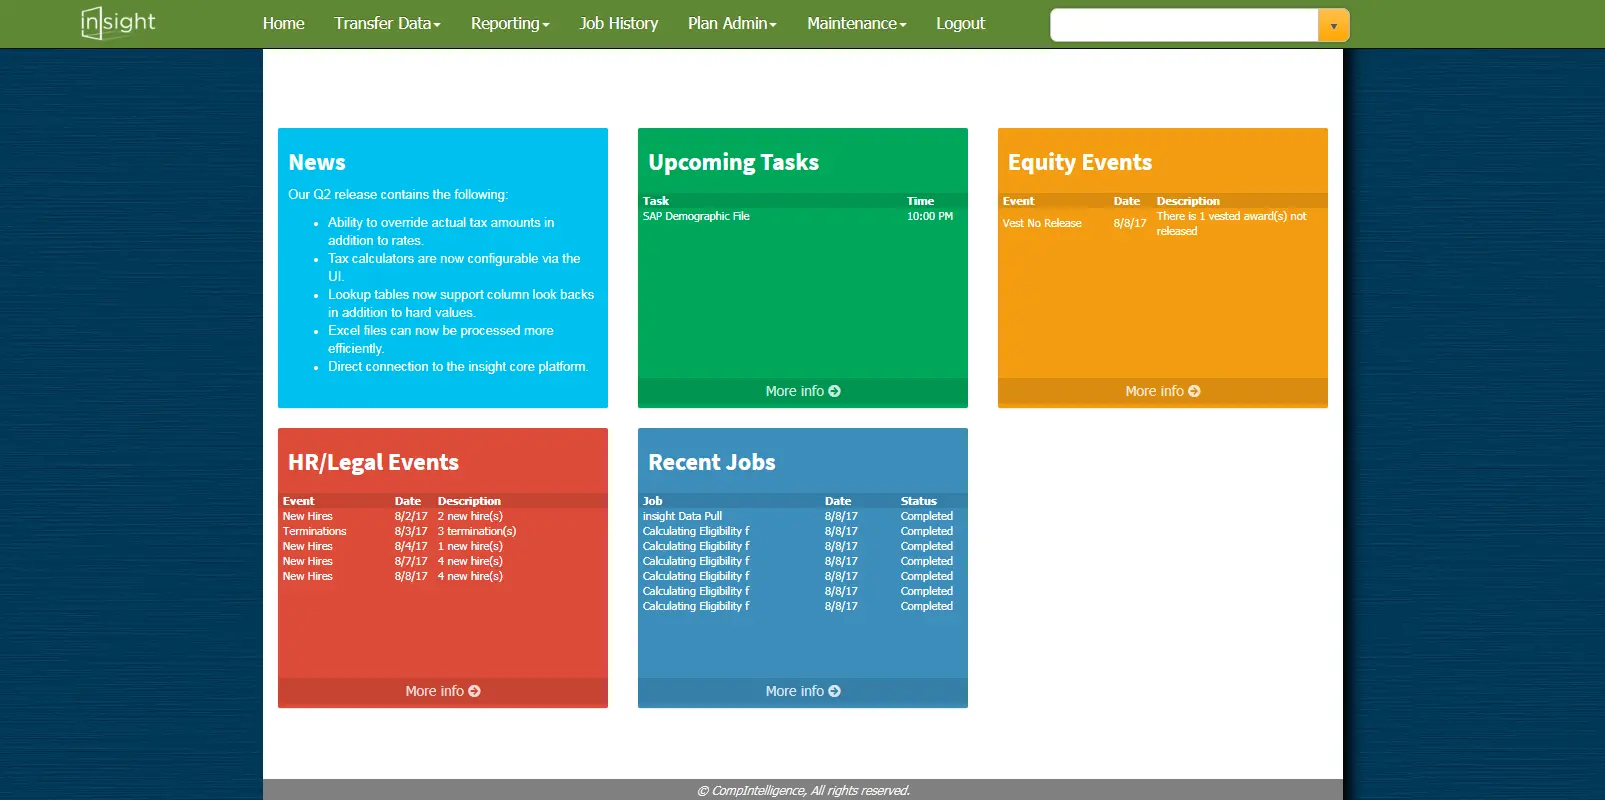 OptionTrax screenshot: OptionTrax plan administration dashboard